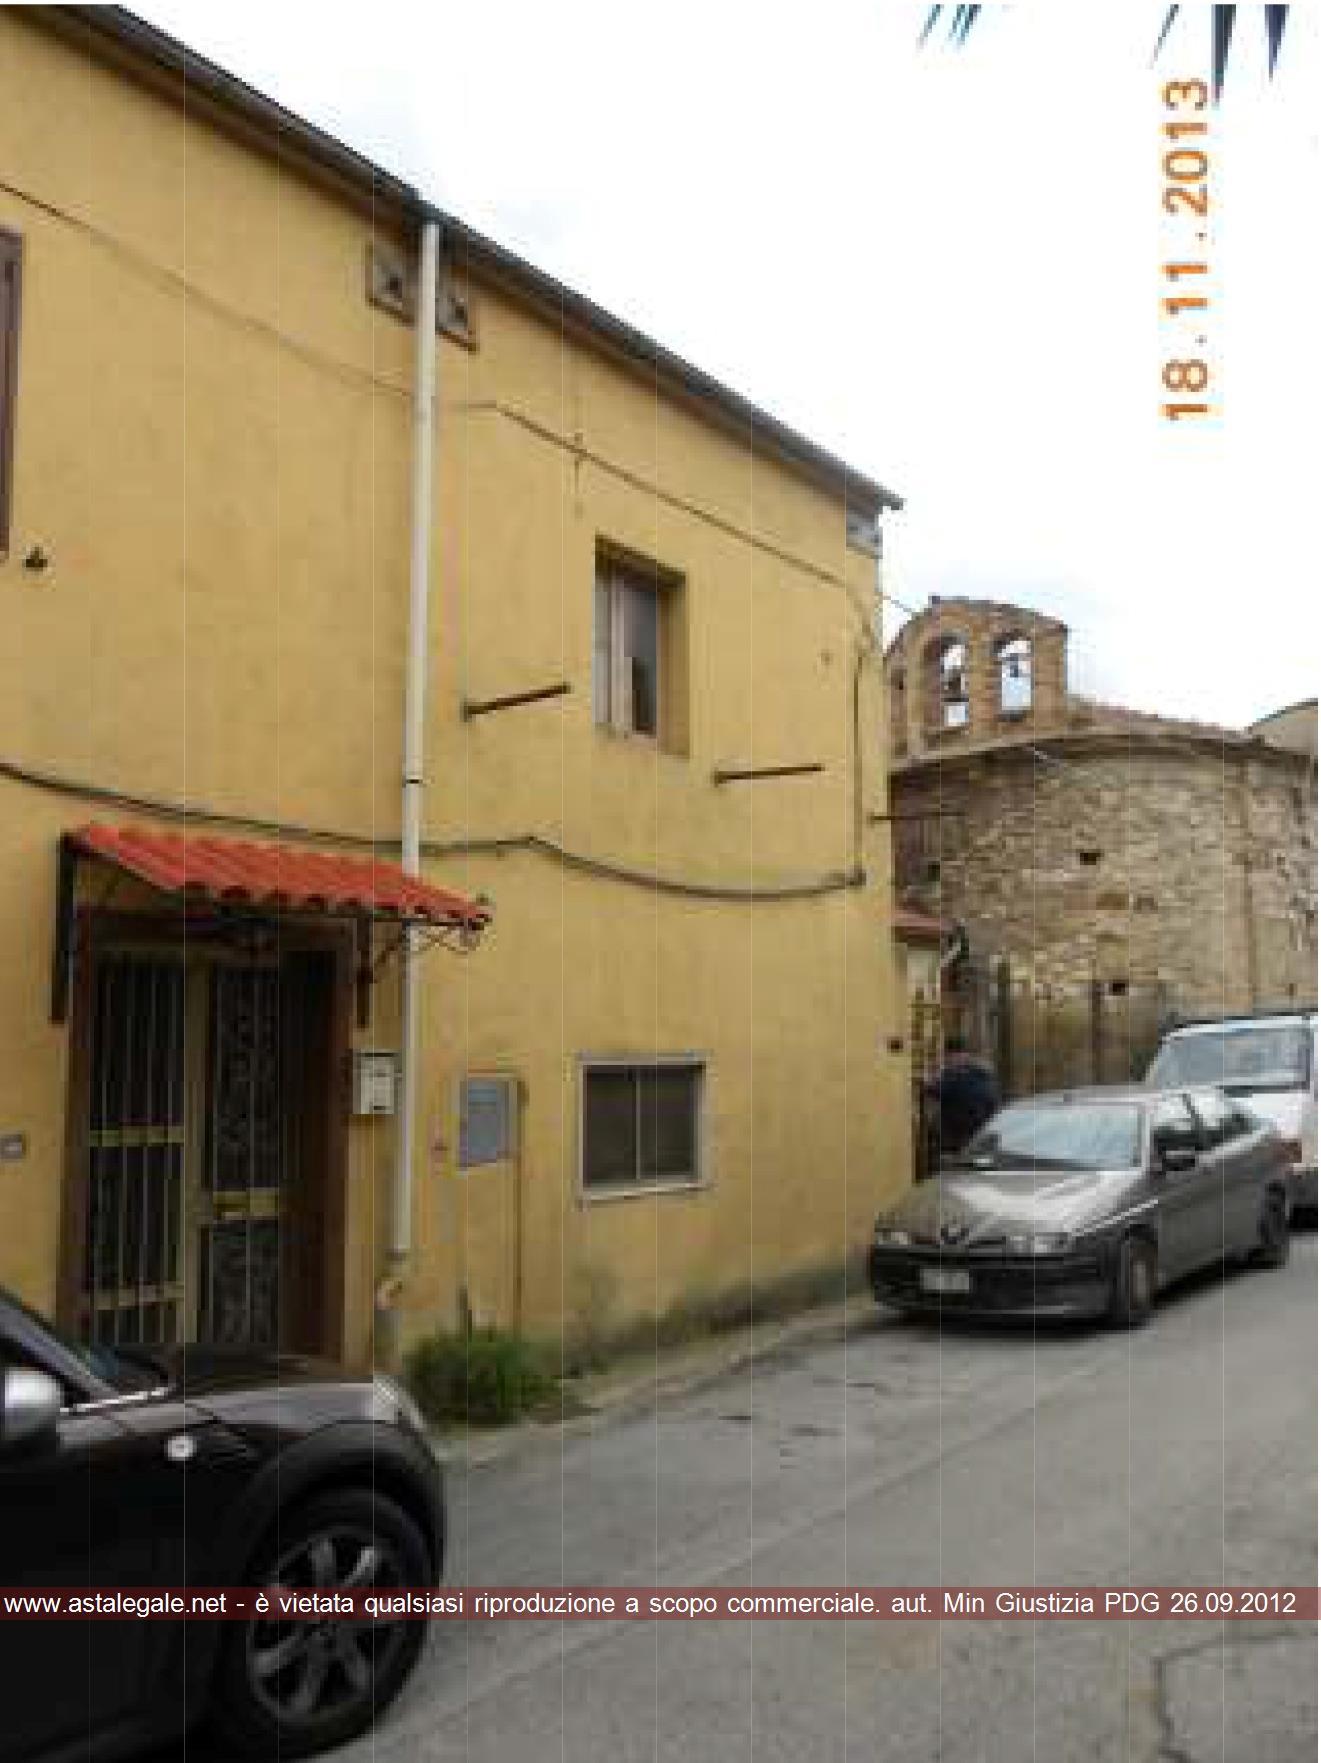 Venafro (IS) Via Quinto Vibio